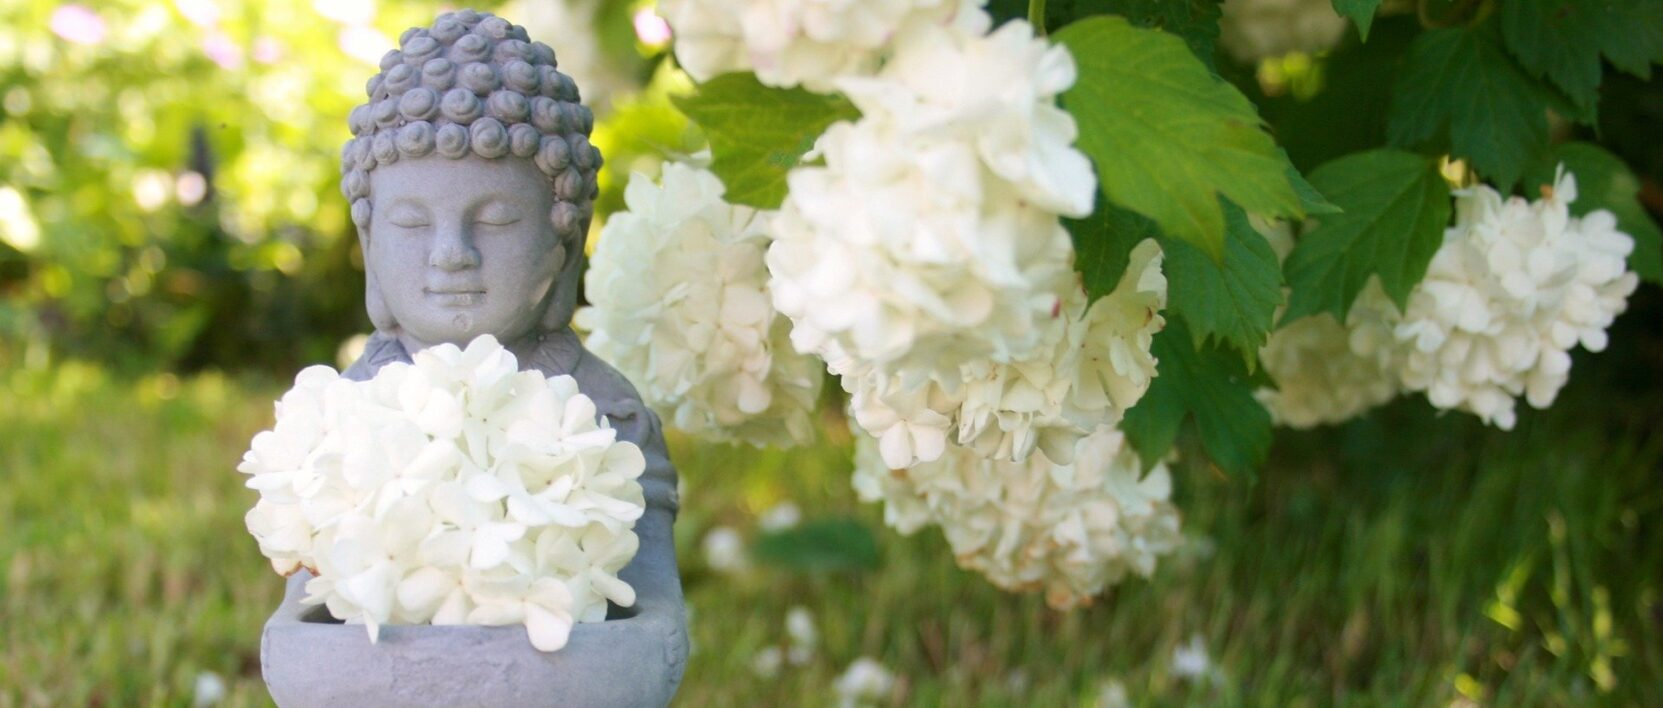 Namaste Online Today Welcome Image